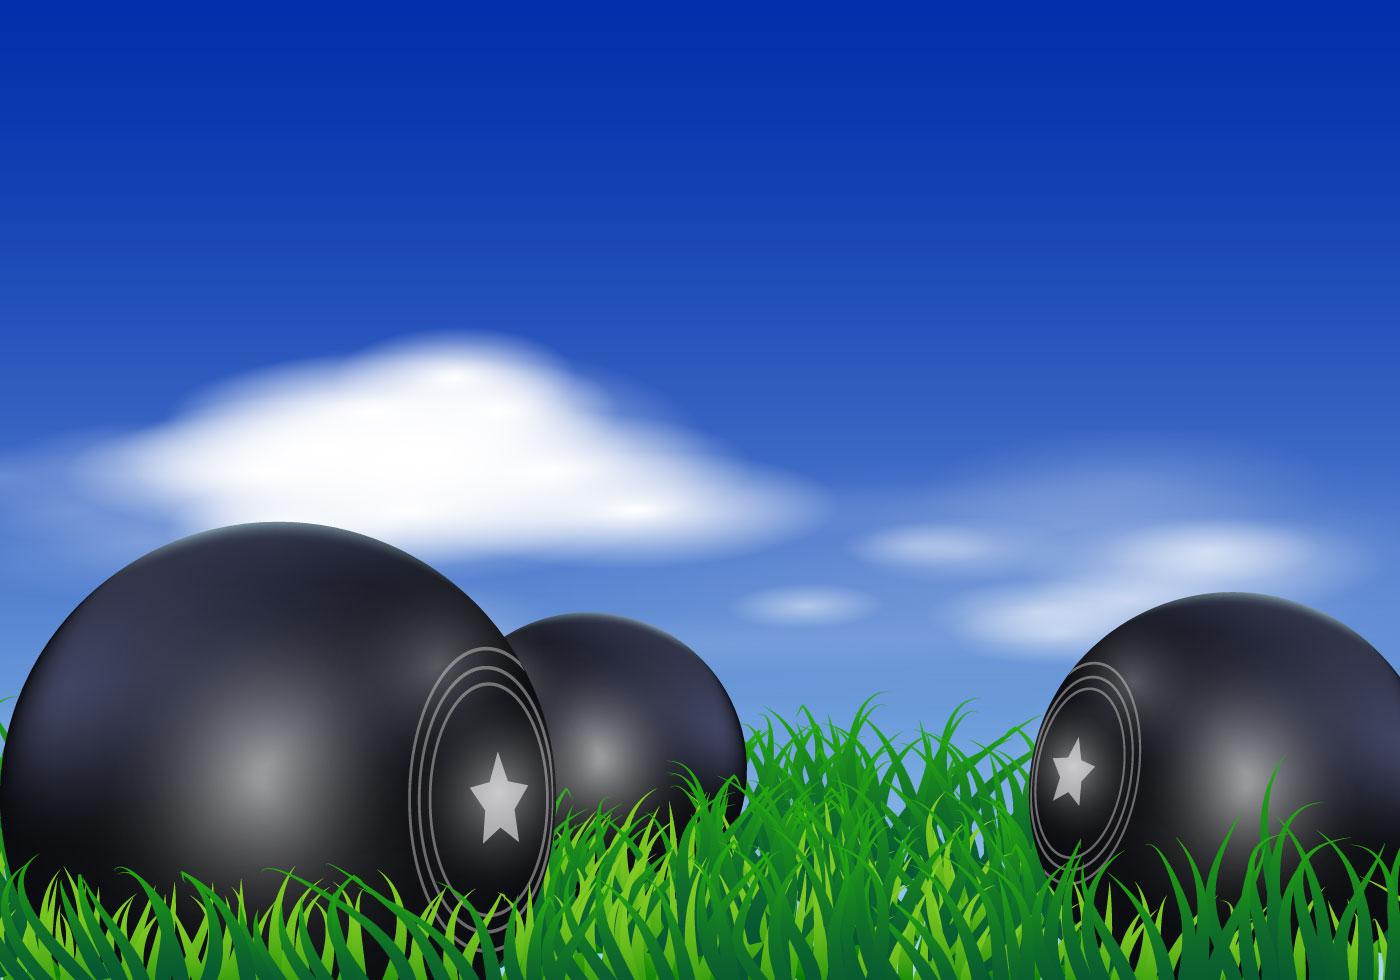 lawn bowls vector